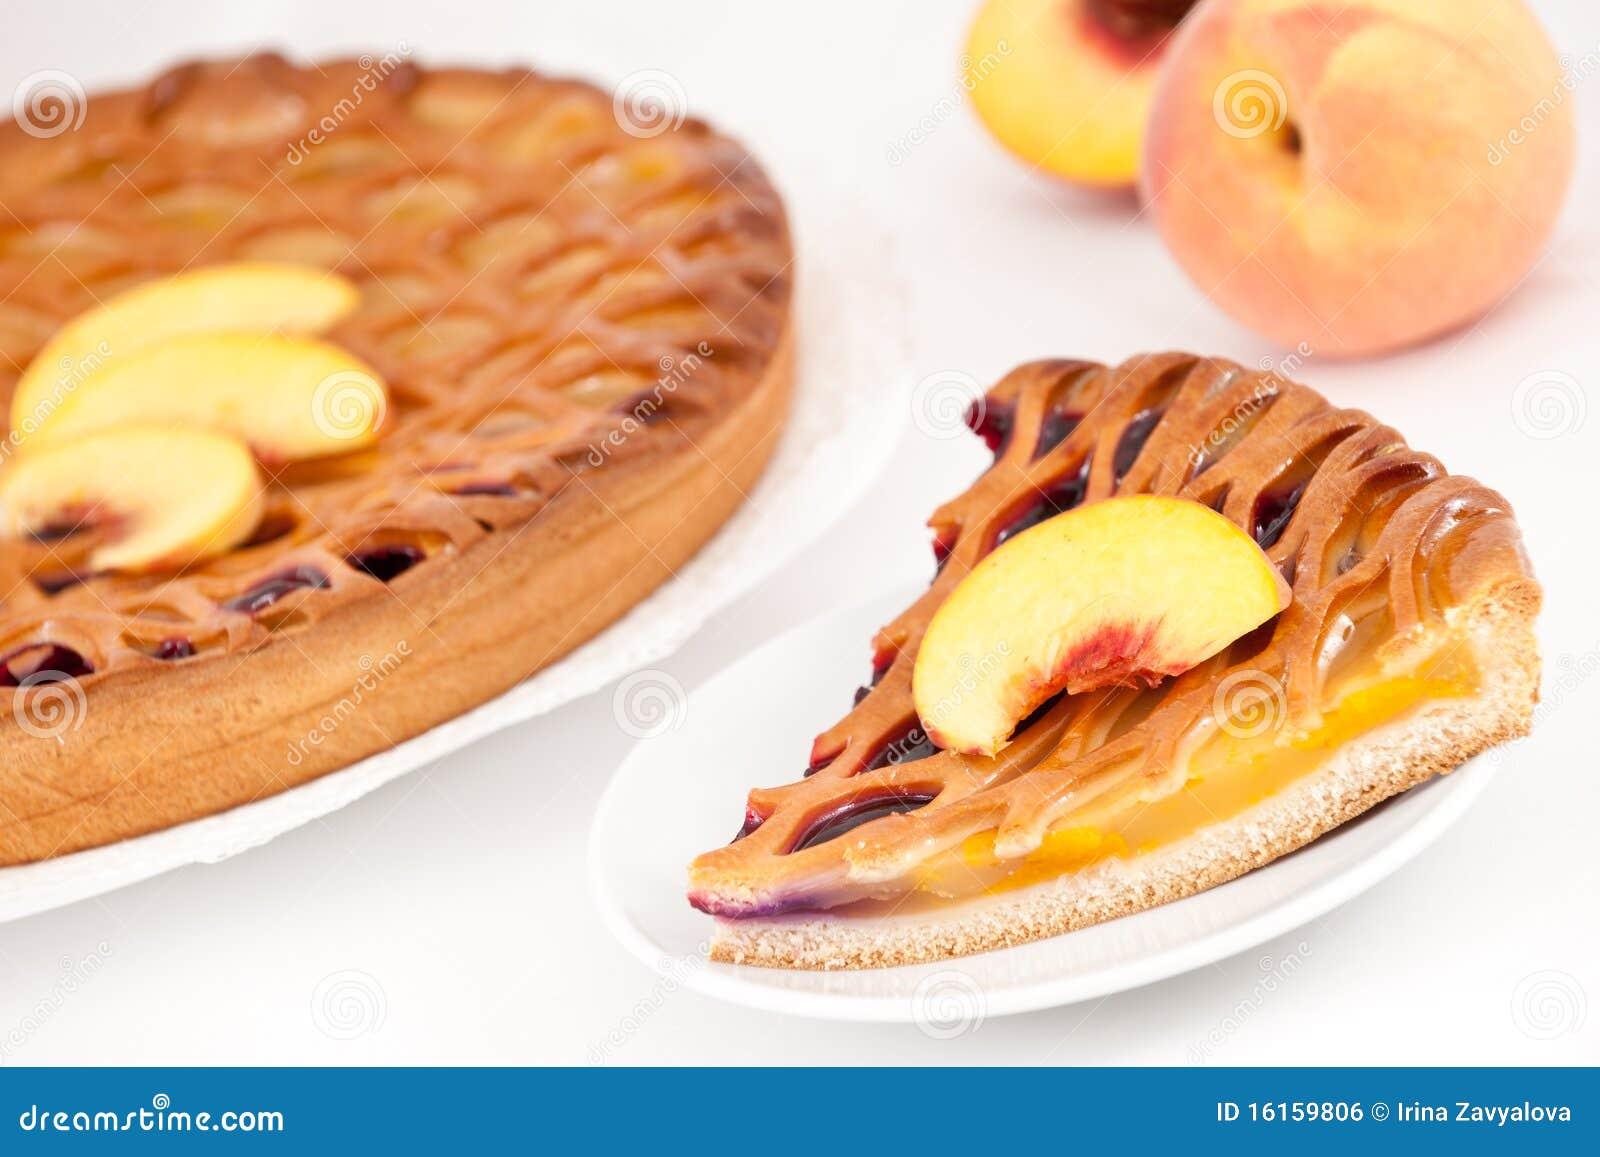 Peach-cherry Pie Royalty Free Stock Image - Image: 16159806